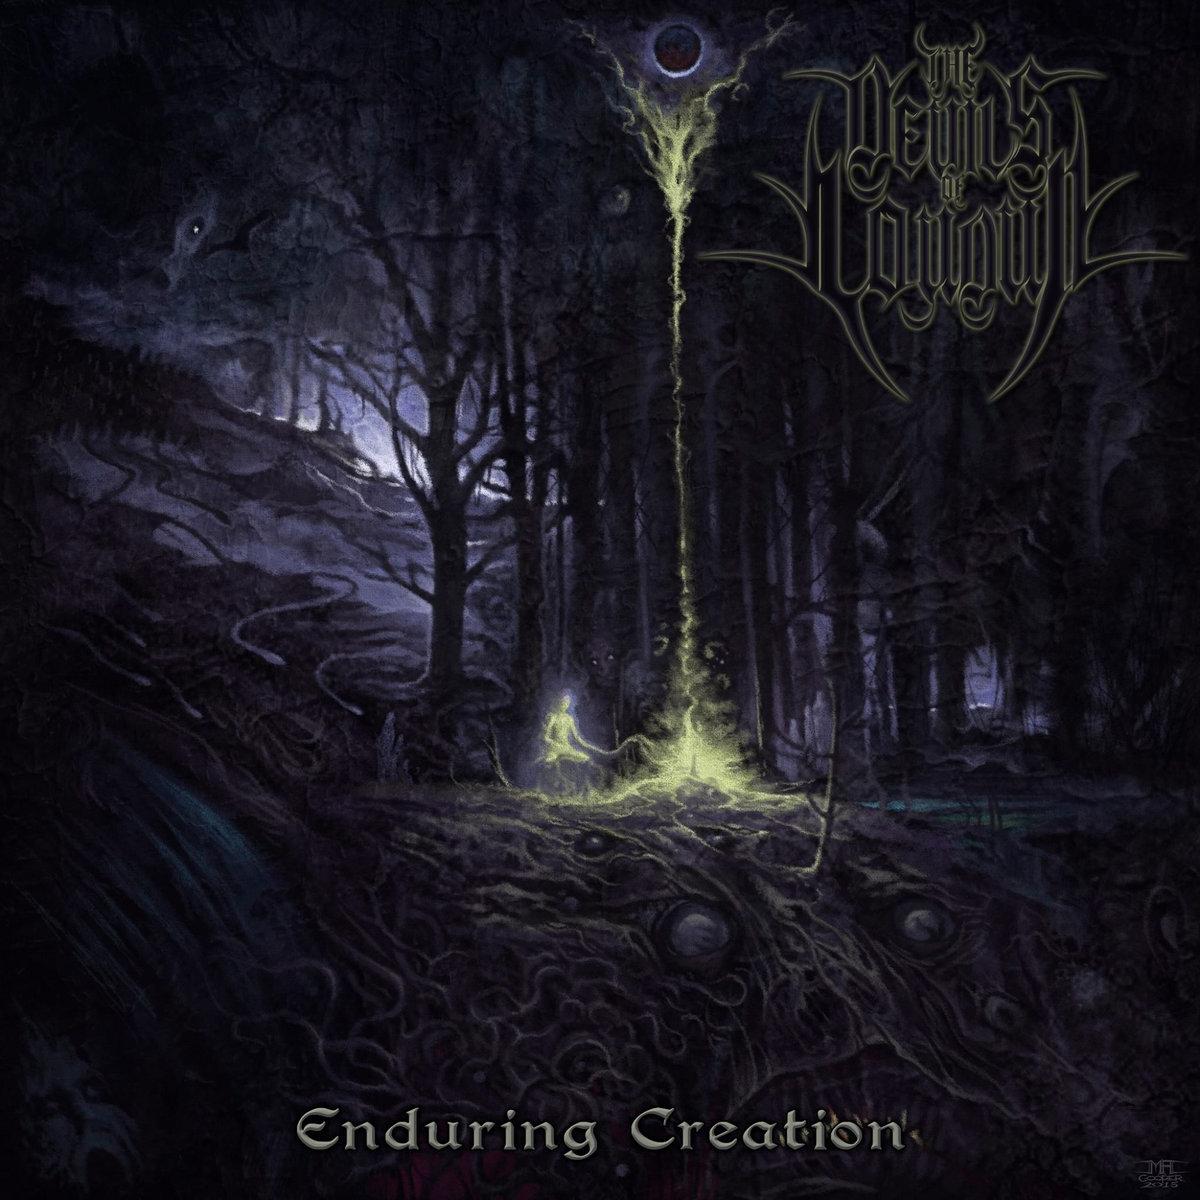 Enduring Creation | The Devils of Loudun